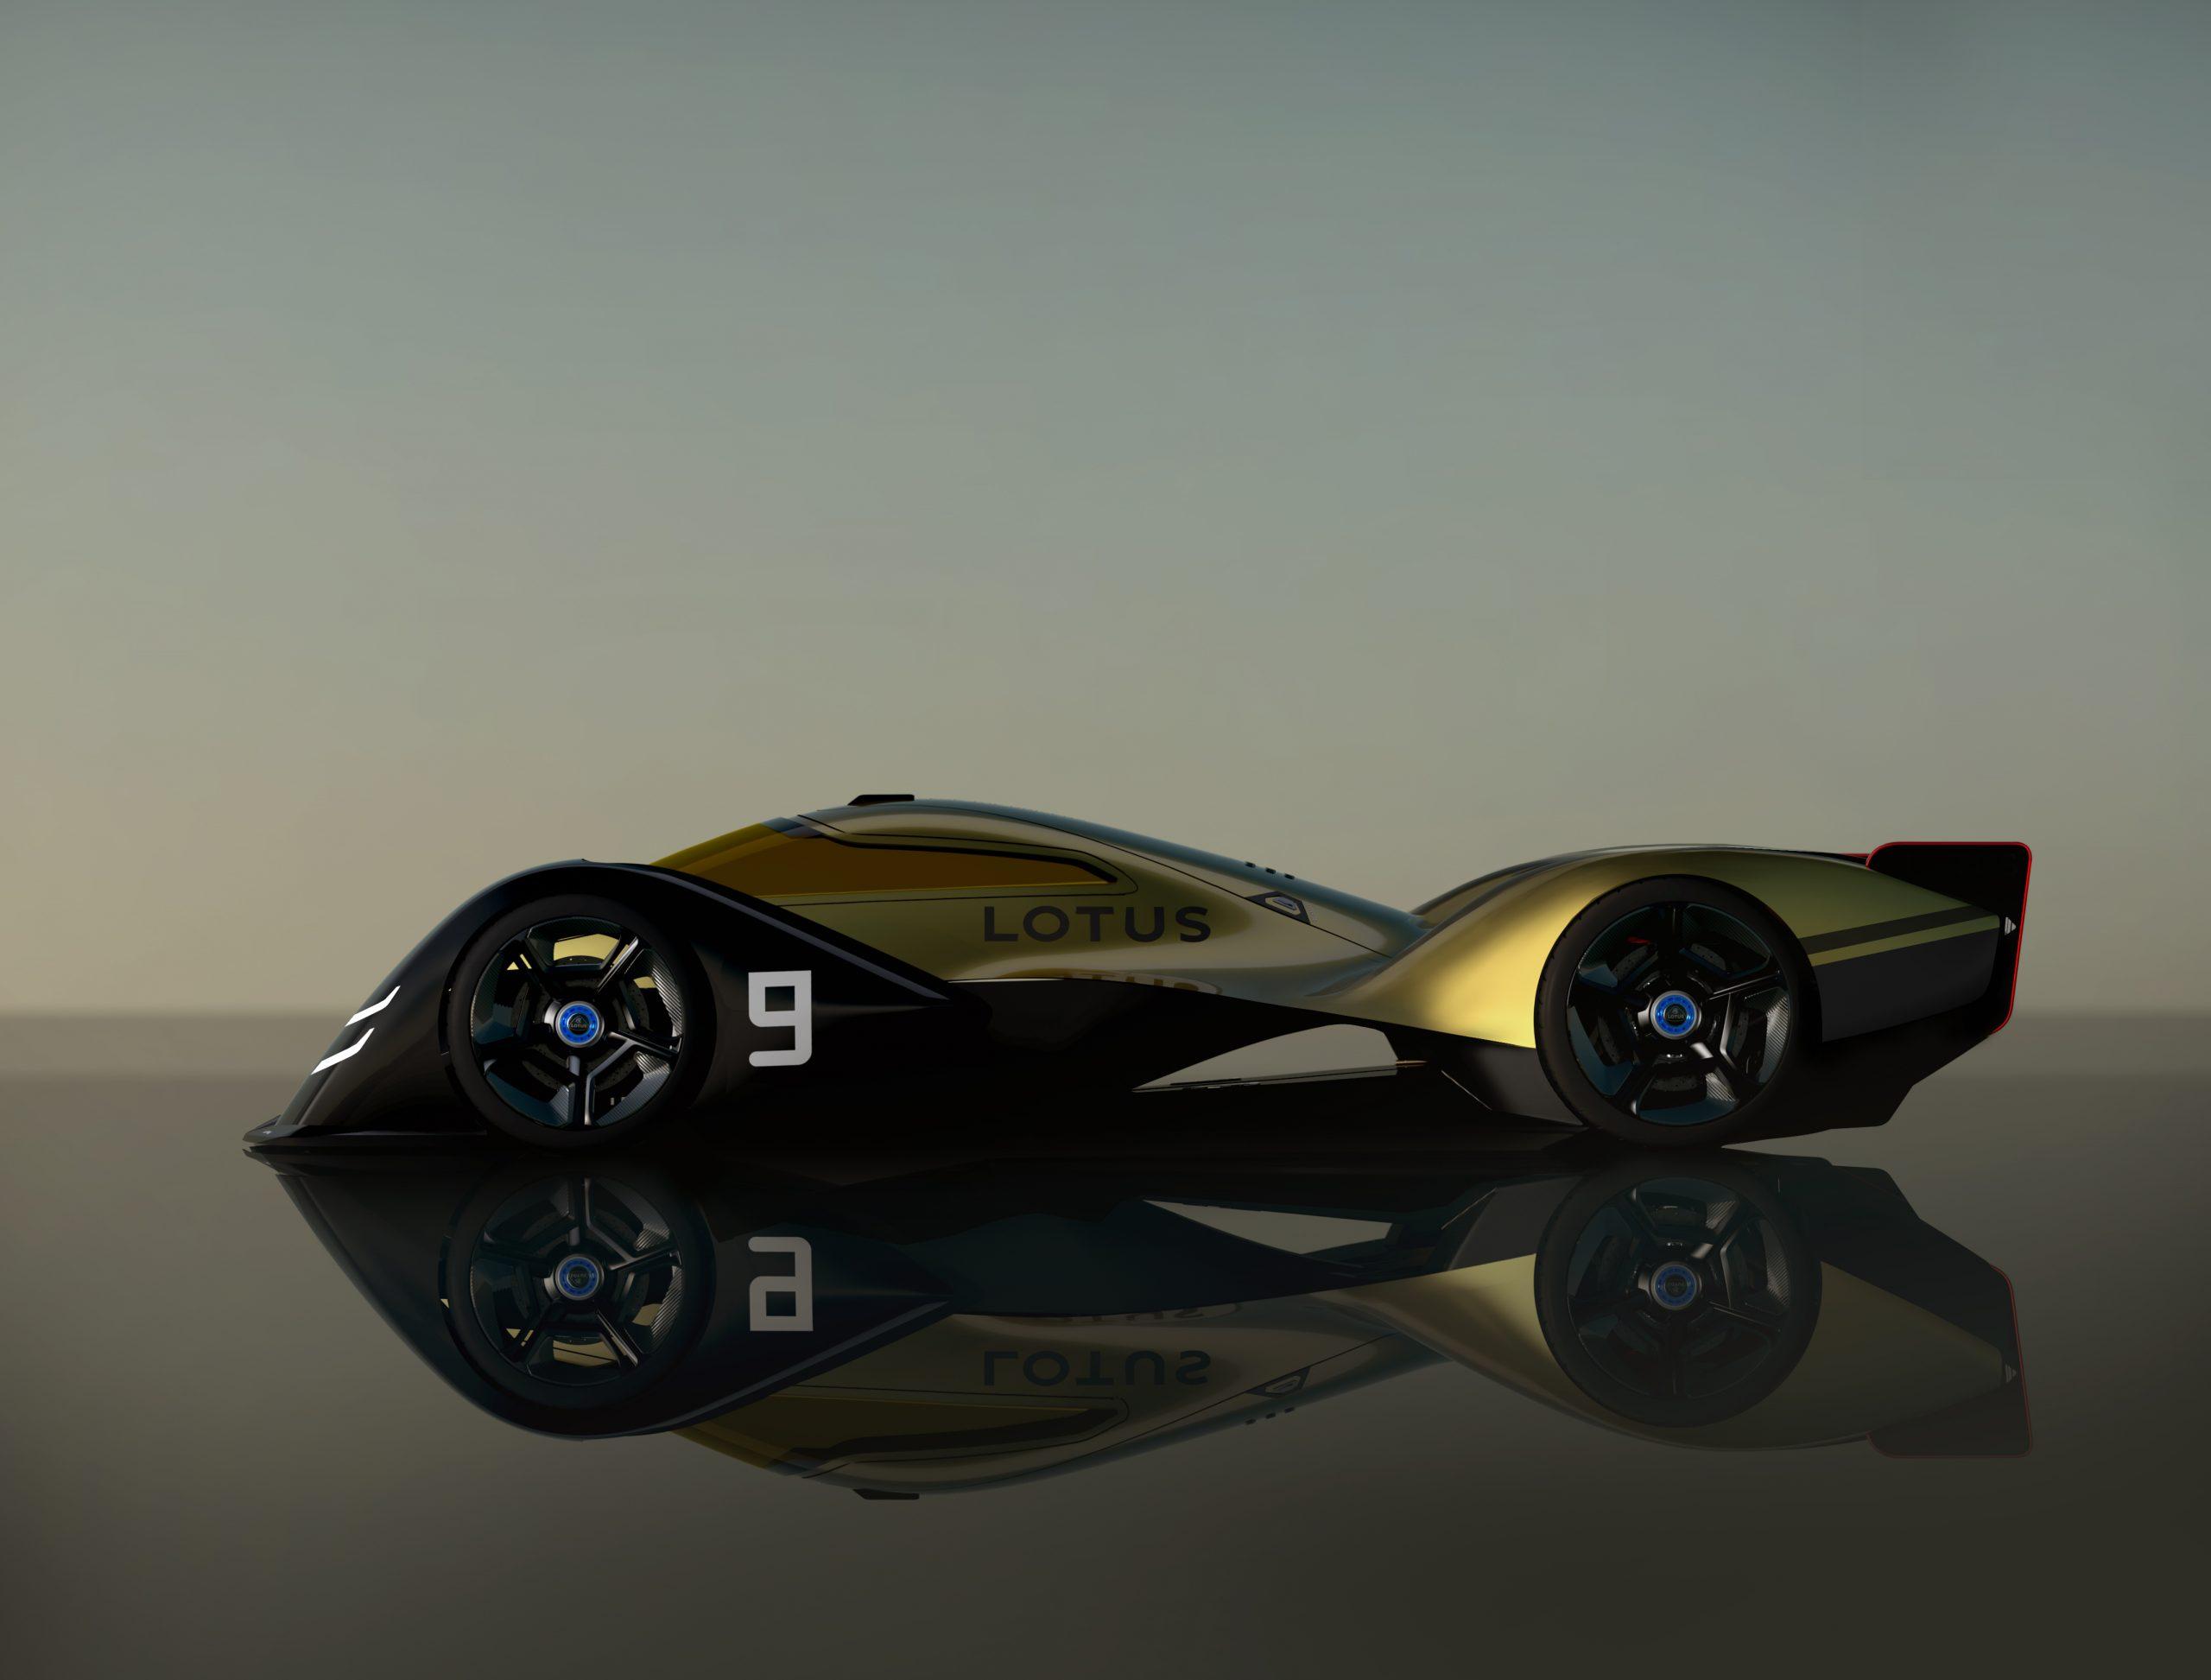 Lotusenduranceracer2030_3